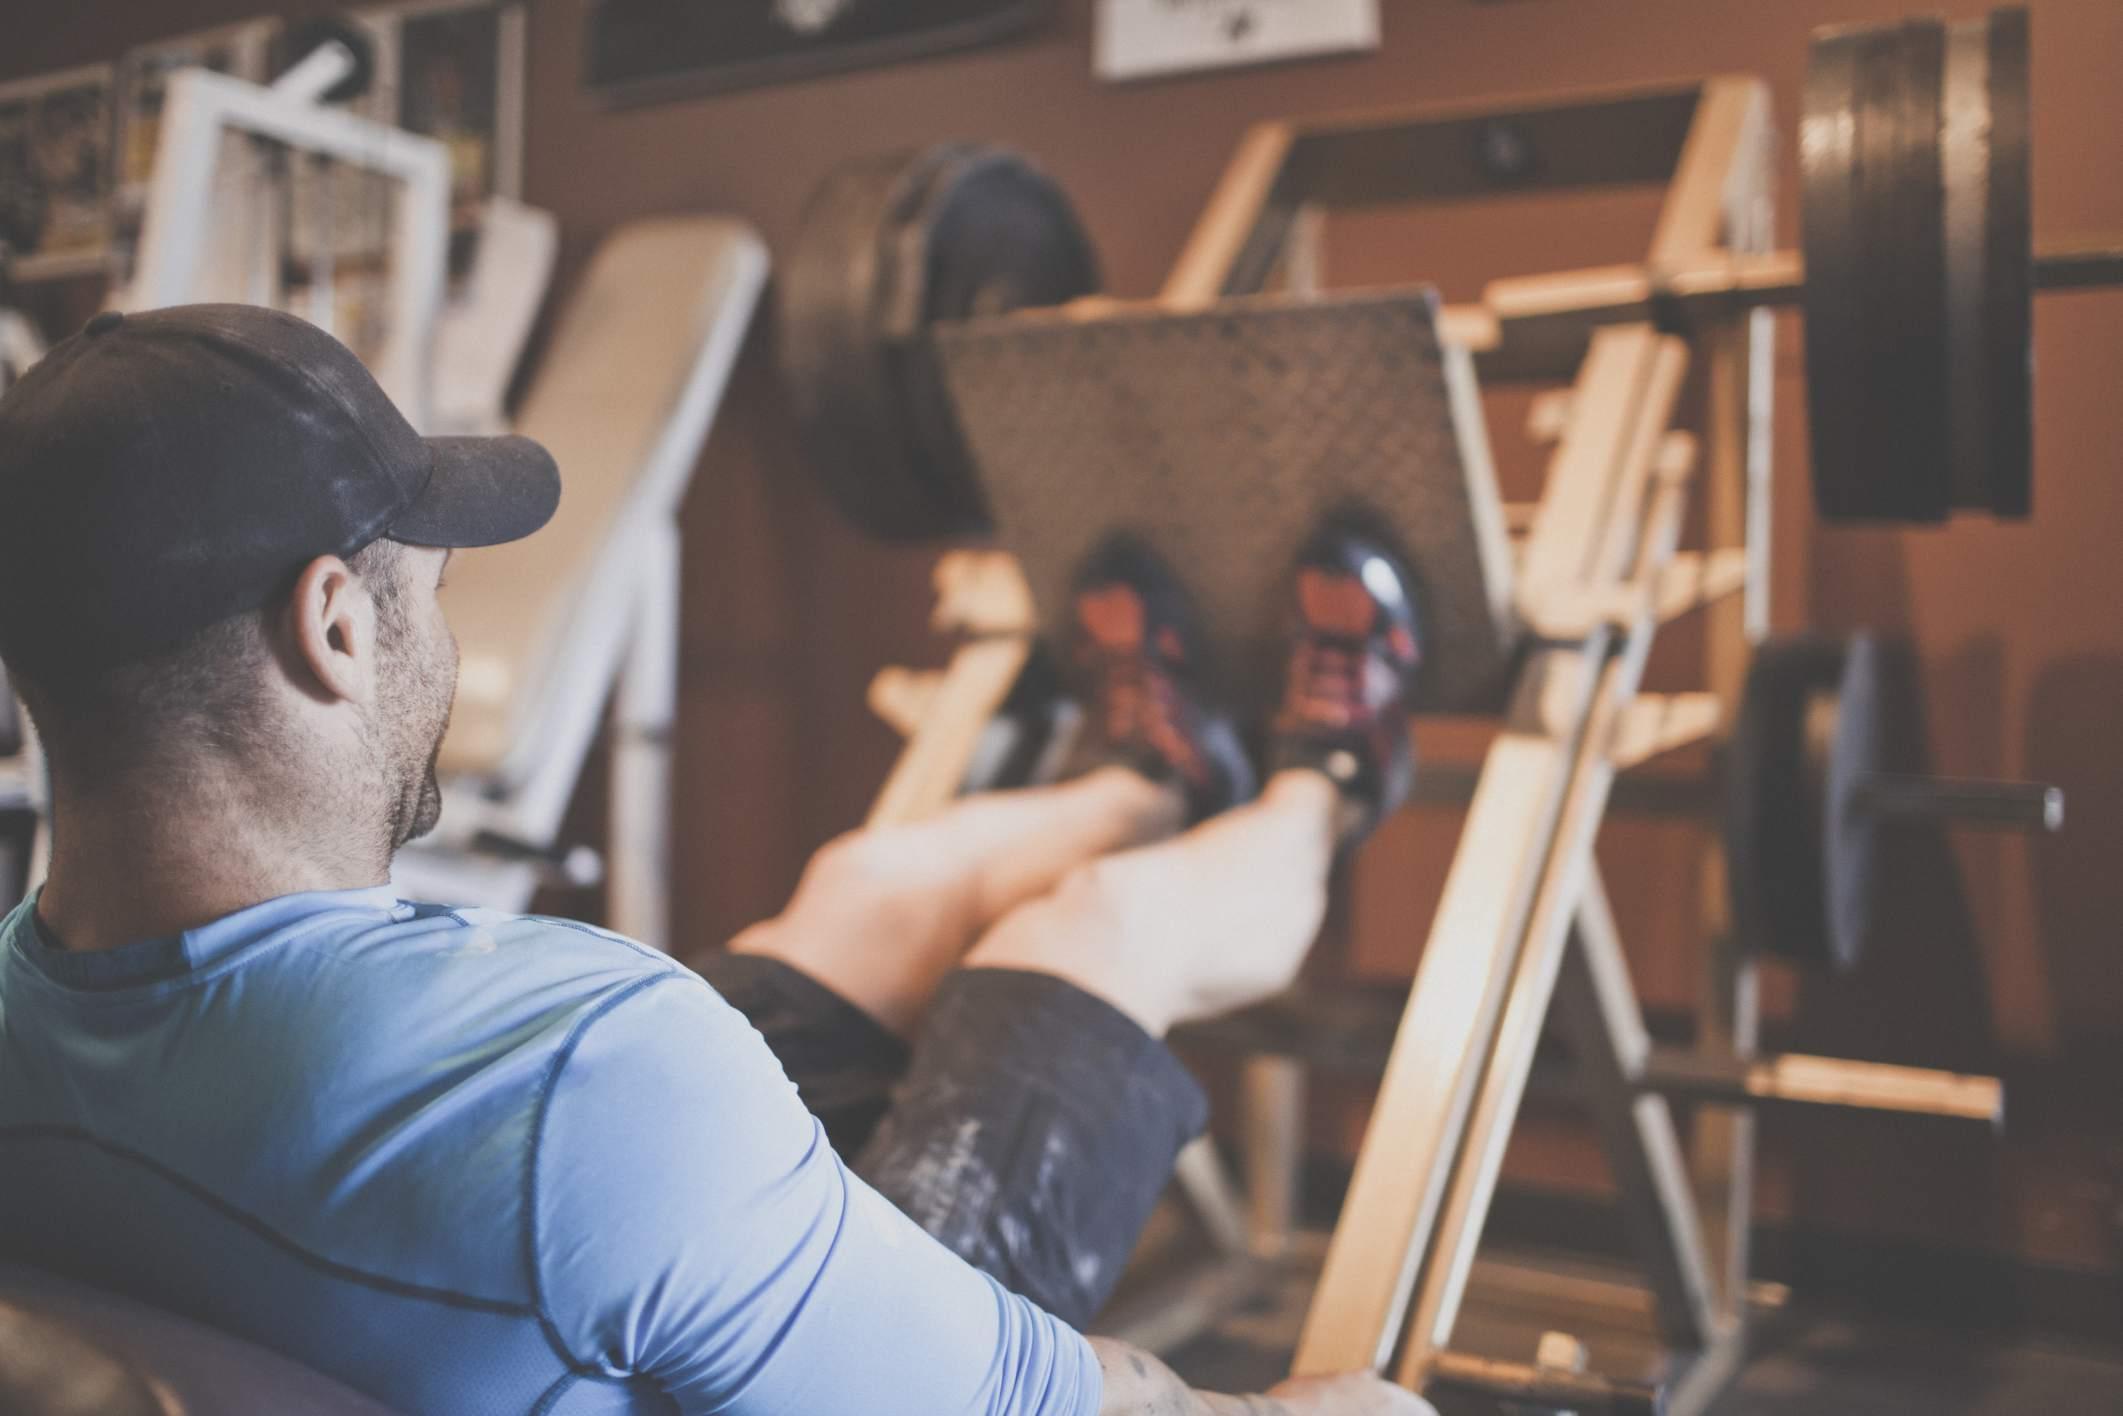 man using leg press in gym